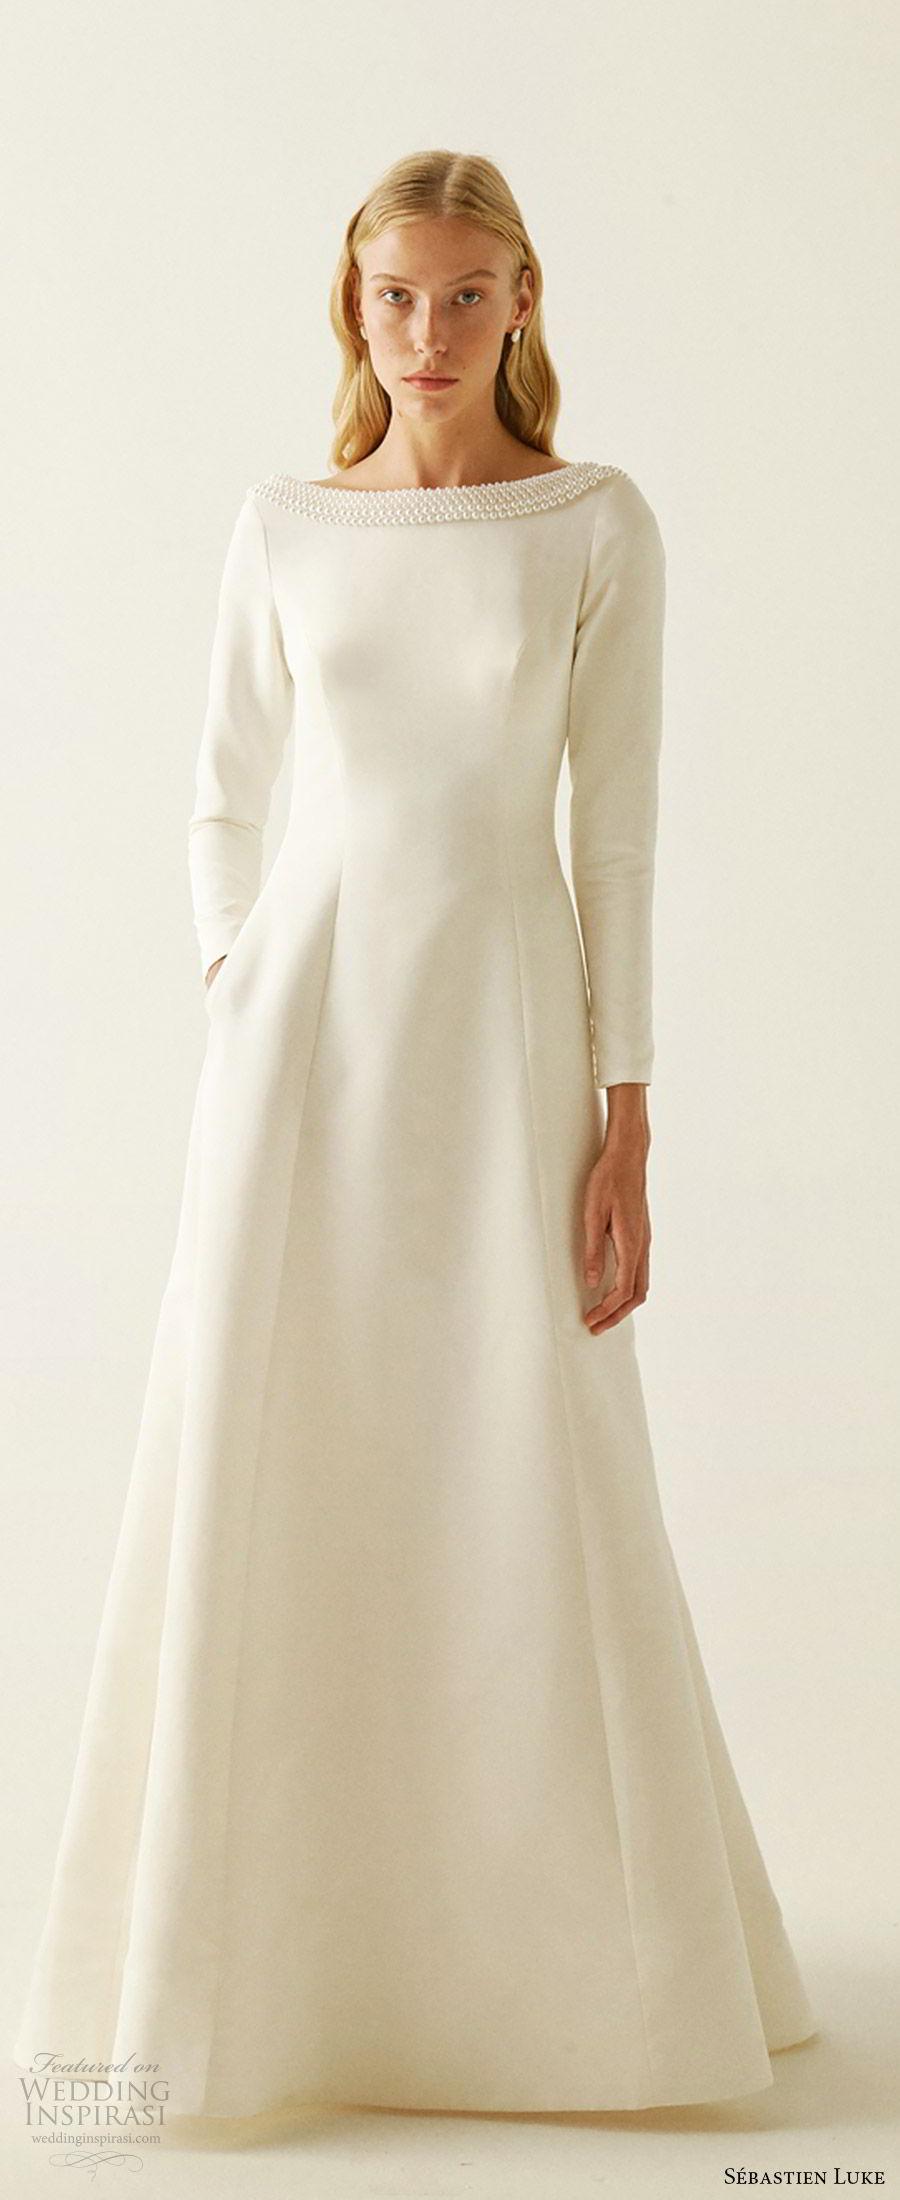 sebastien luke fall 2019 bridal jewel neckline long sleeves minimal embellishment modified a line wedding dress pockets clean simple modern (4) mv